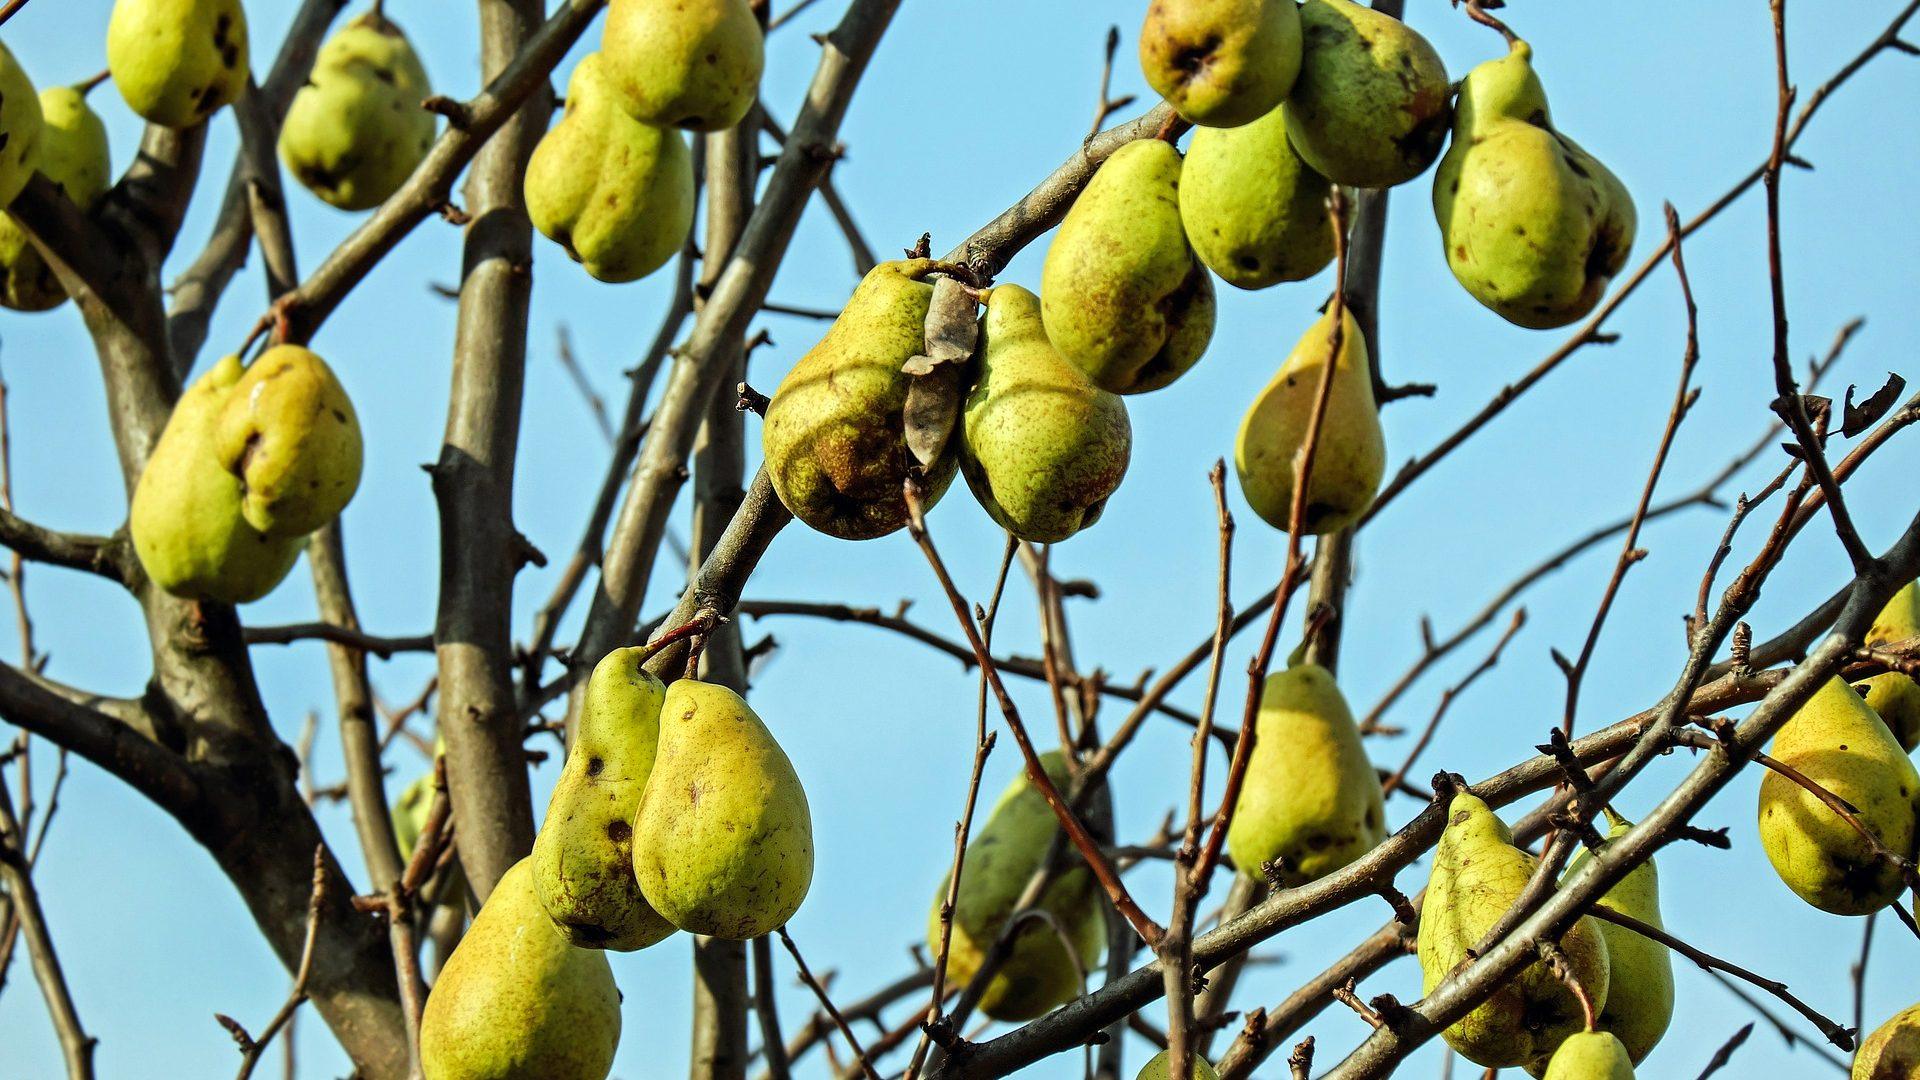 pears-1756873_1920